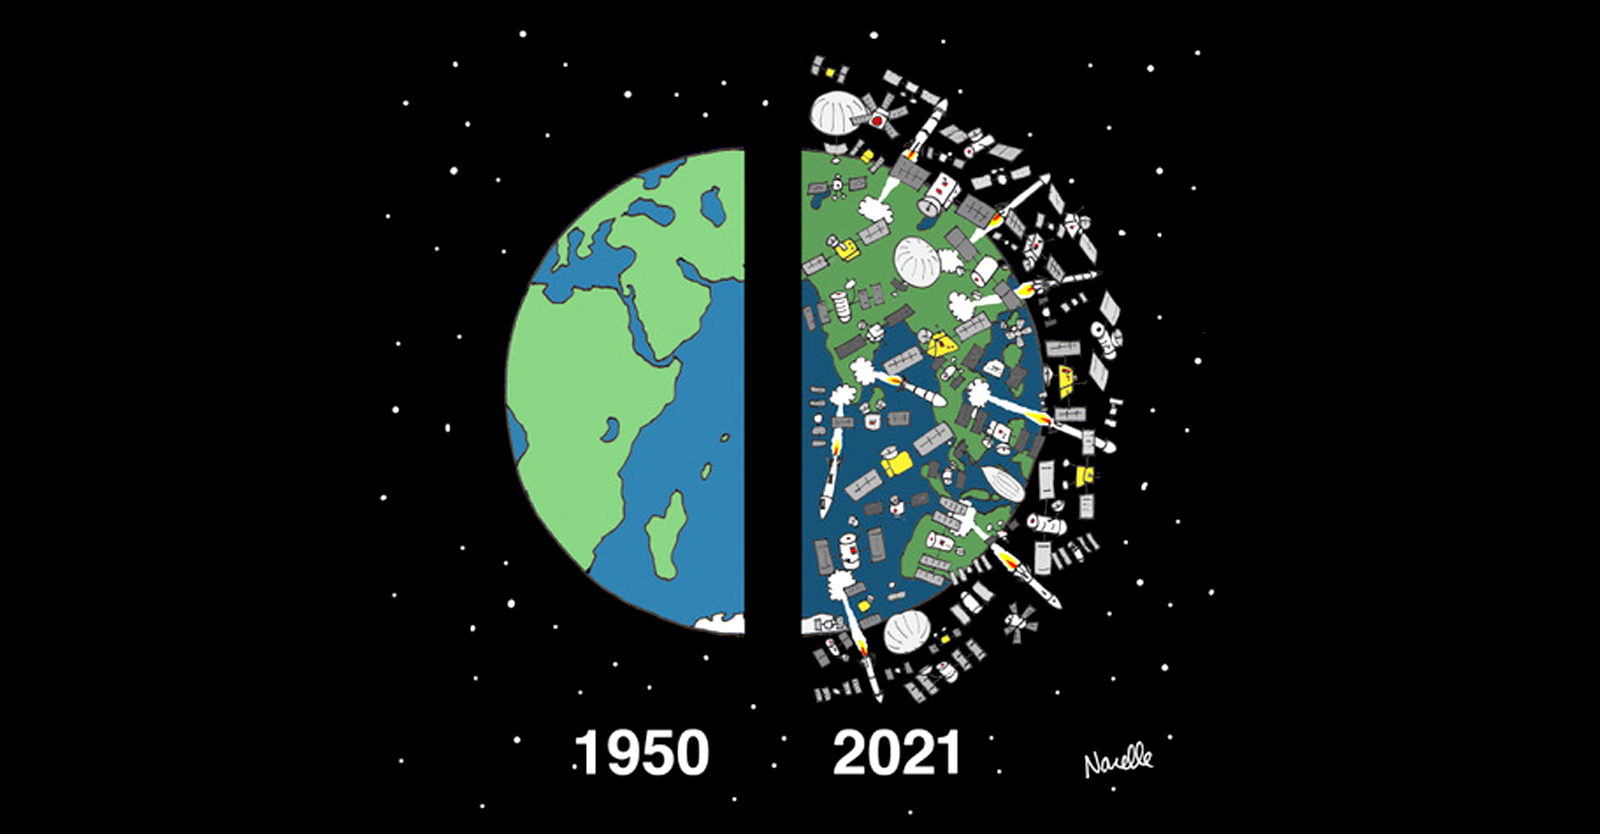 coalition-to-protest-spacex-satellite-program,-citing-radiation-threat-•-children's-health-defense